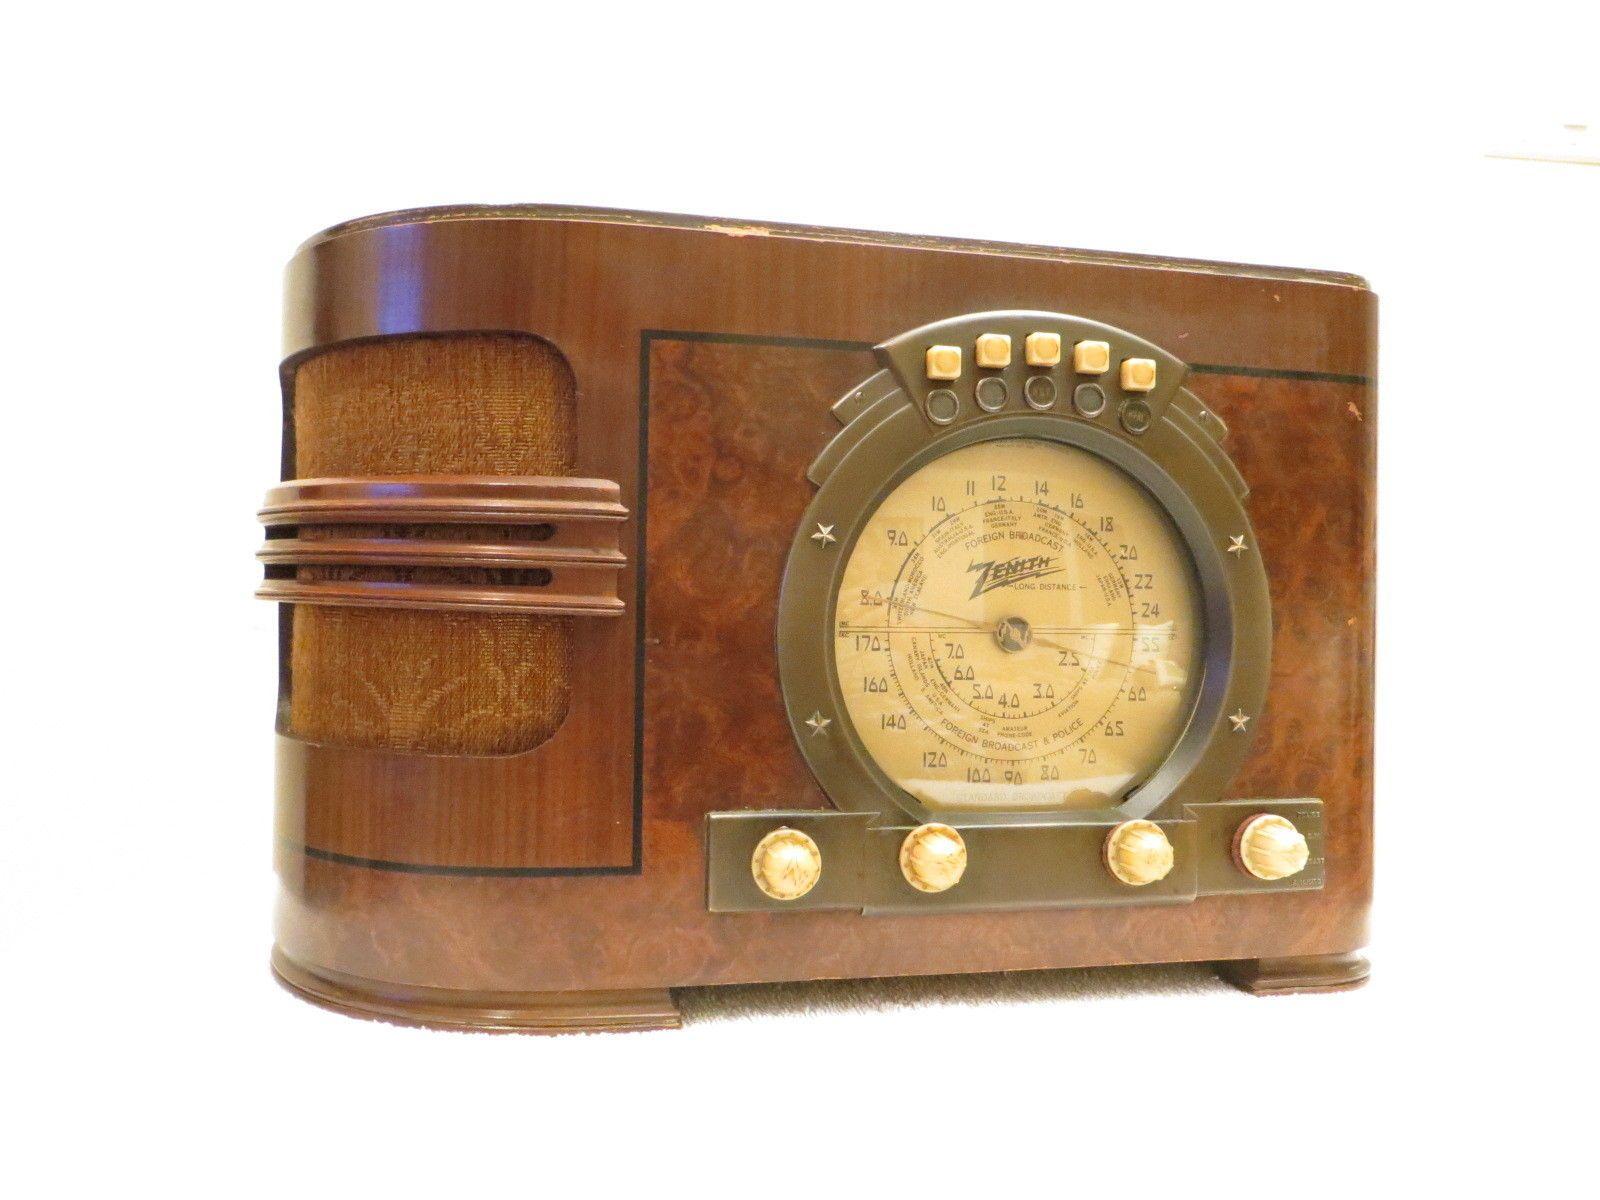 Vintage Old Excellent Original Antique Zenith Classic Stars Amp Stripes Tube Radio Vintage Radio Radio Old Radios